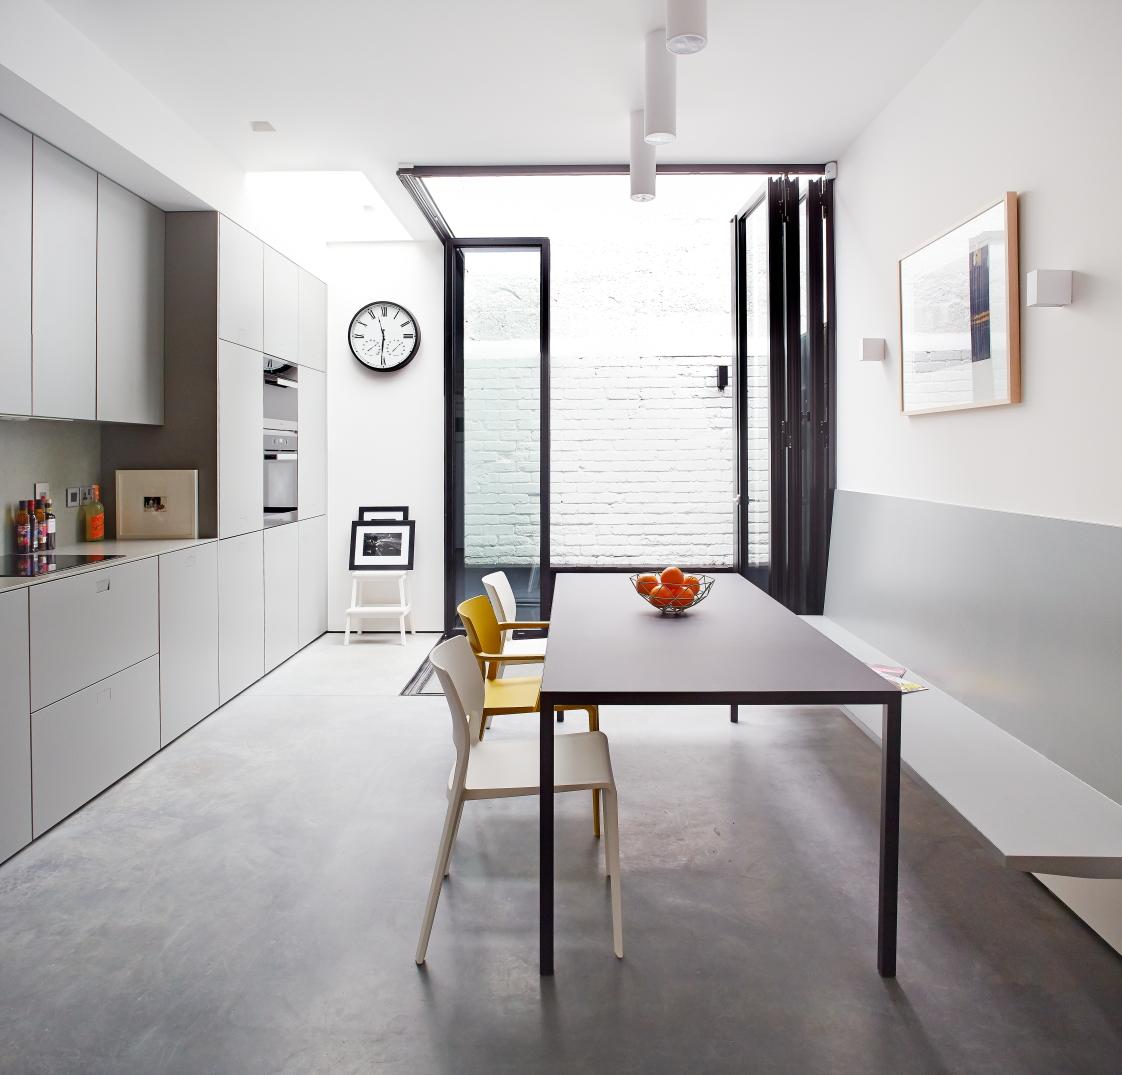 Large folding glass door in contemporary minimalist kitchen